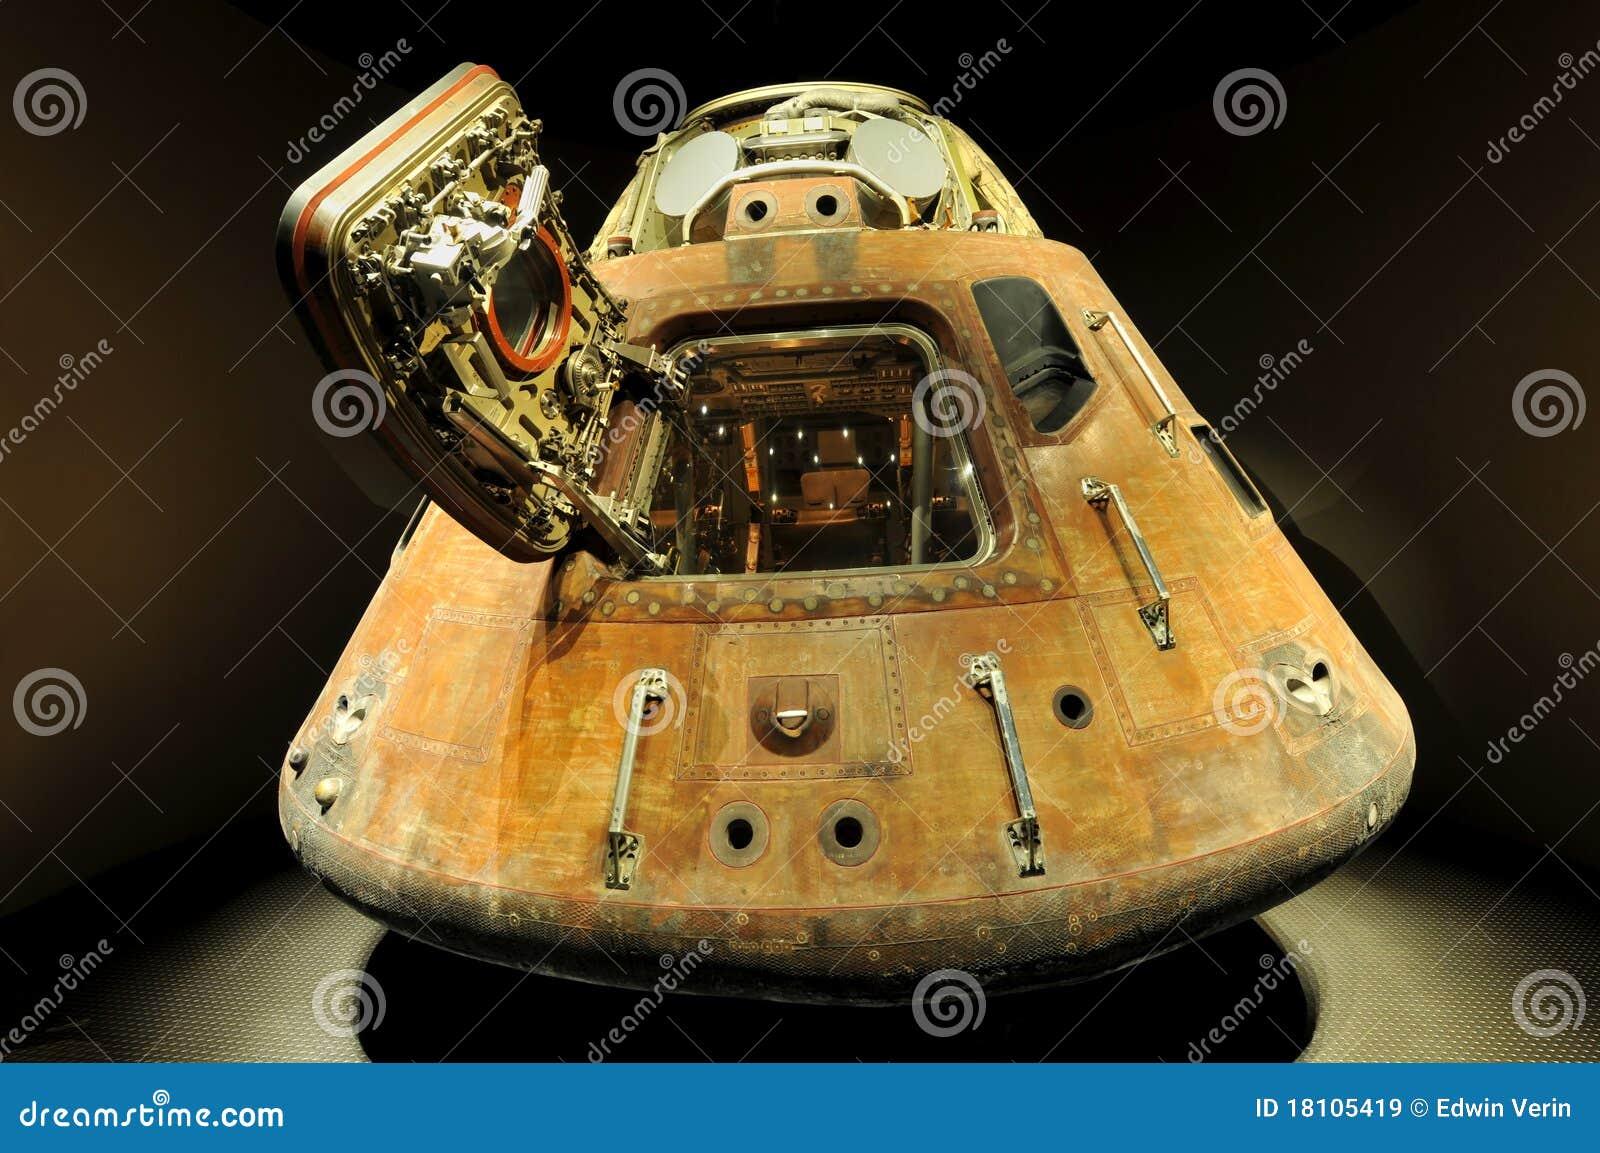 apollo 3 capsule - photo #9